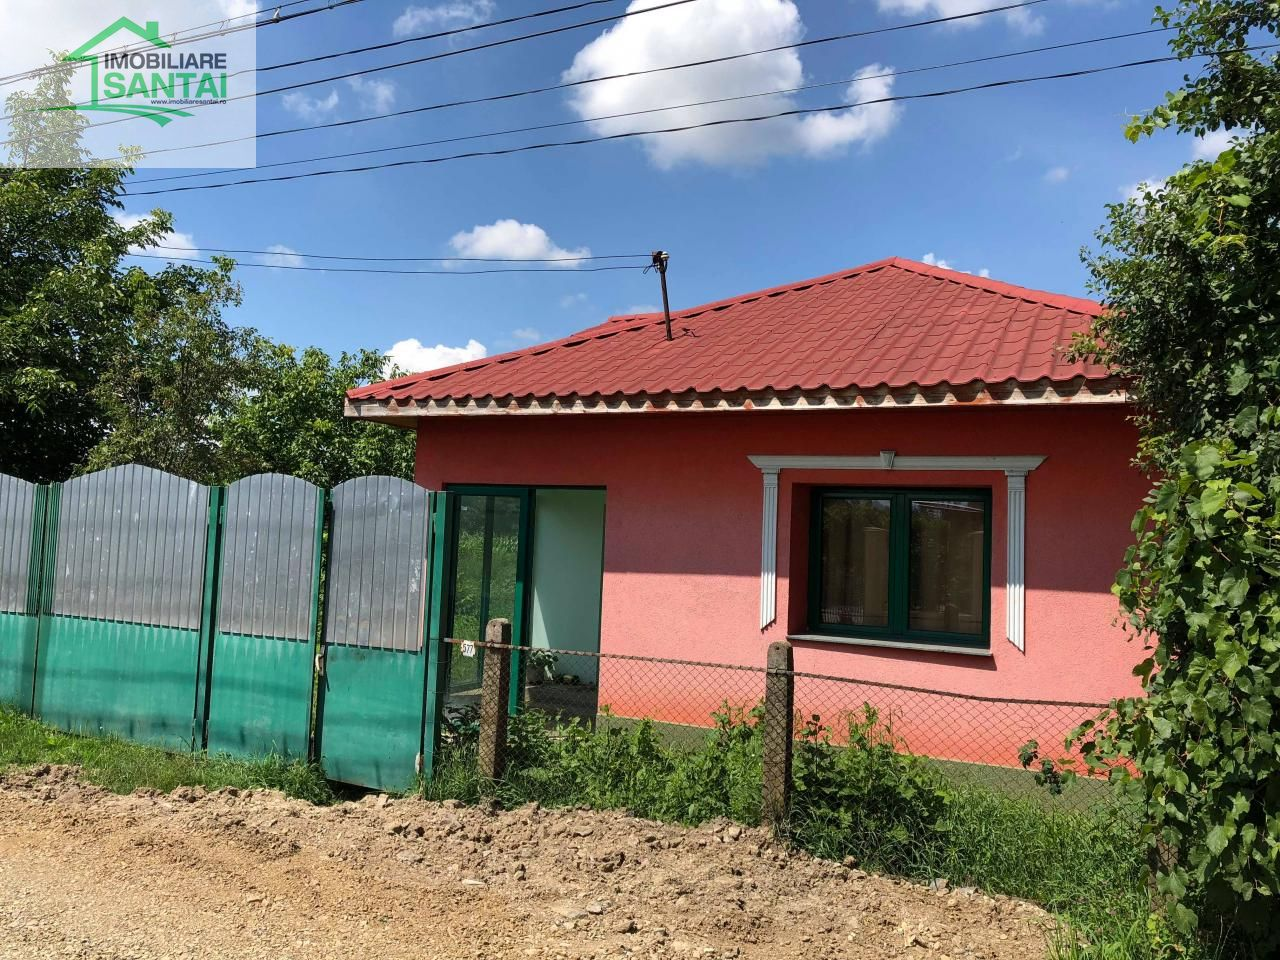 Casa de vanzare, Satu Mare (judet), Lazuri - Foto 3